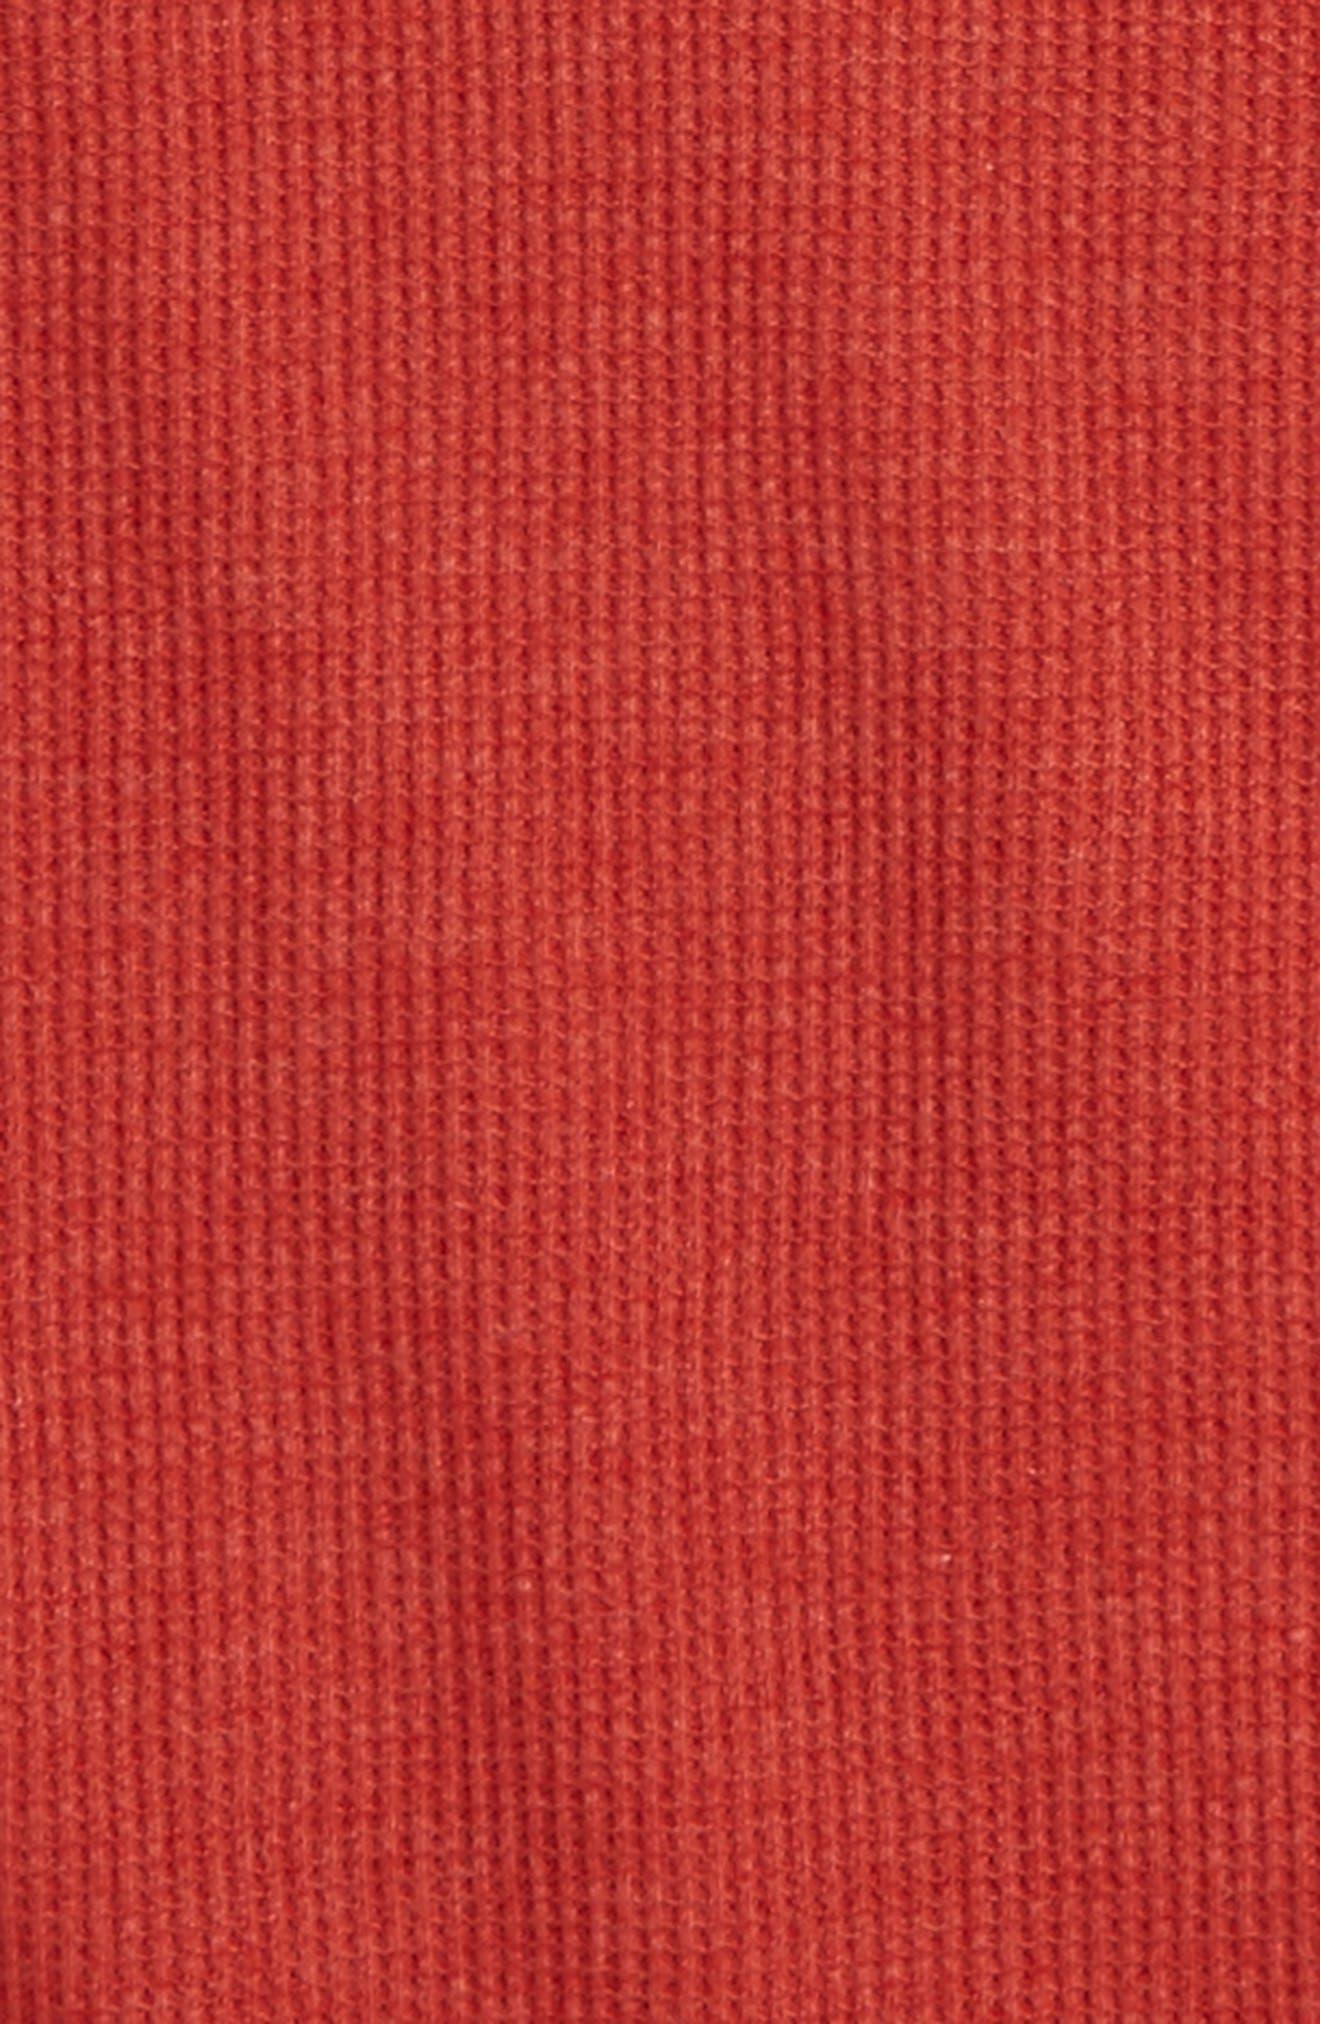 Long Sleeve Thermal T-Shirt,                             Alternate thumbnail 2, color,                             Rust Bossa Nova